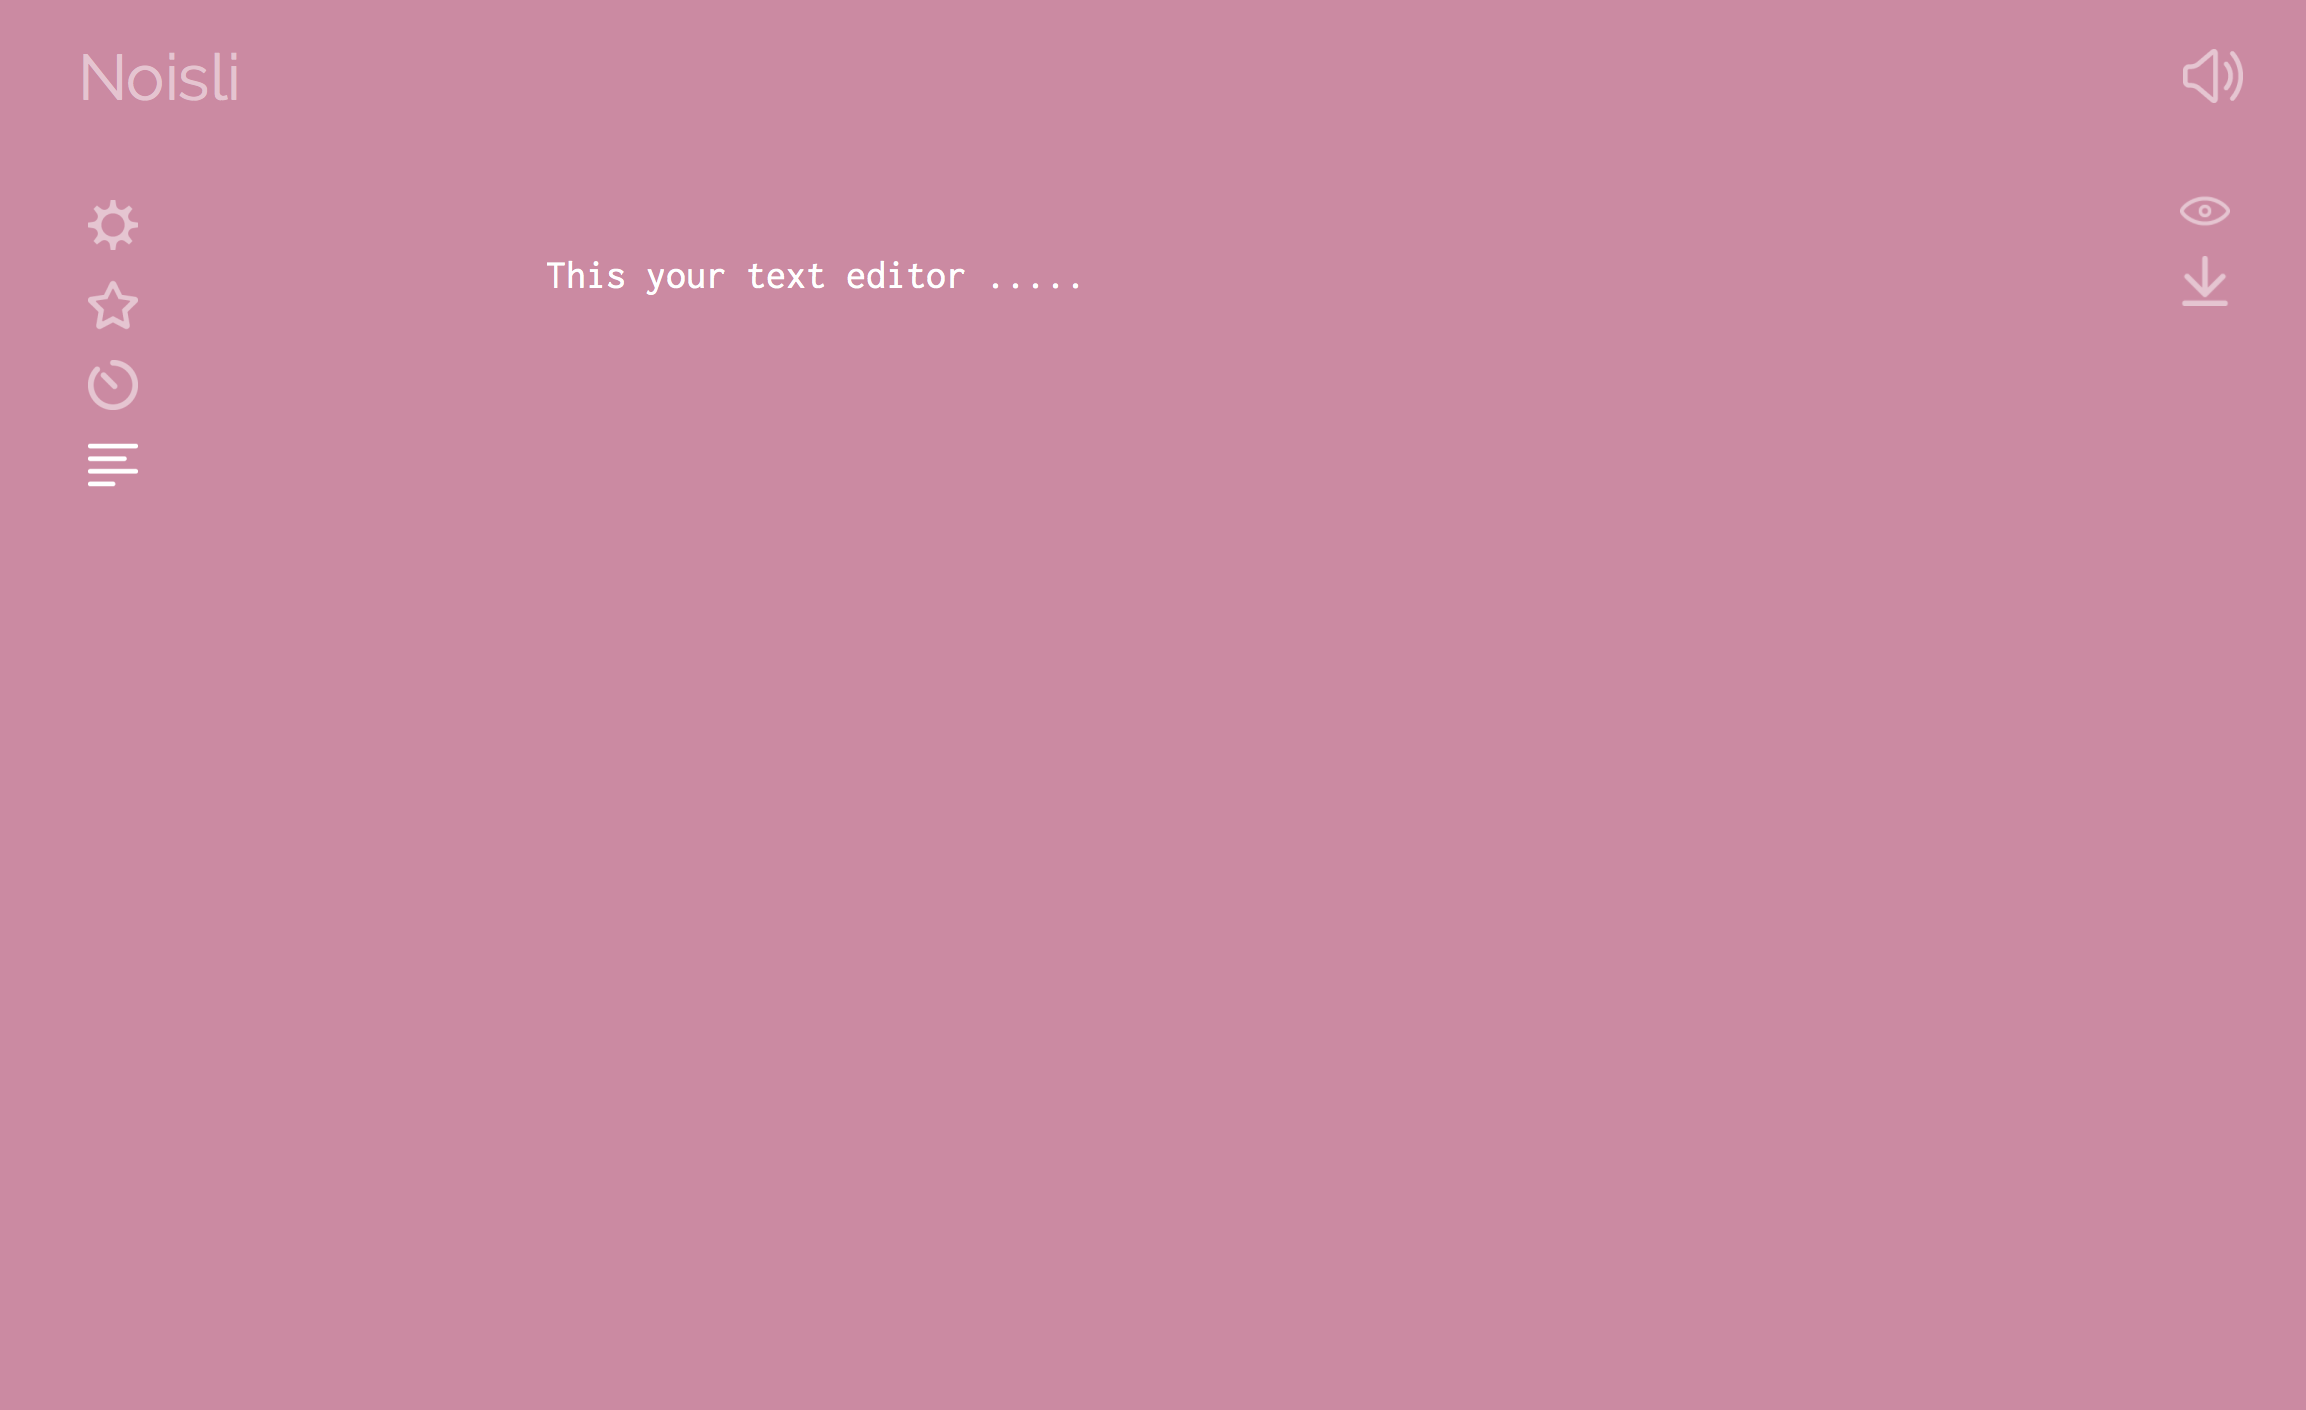 Noisli_Texteditor.png